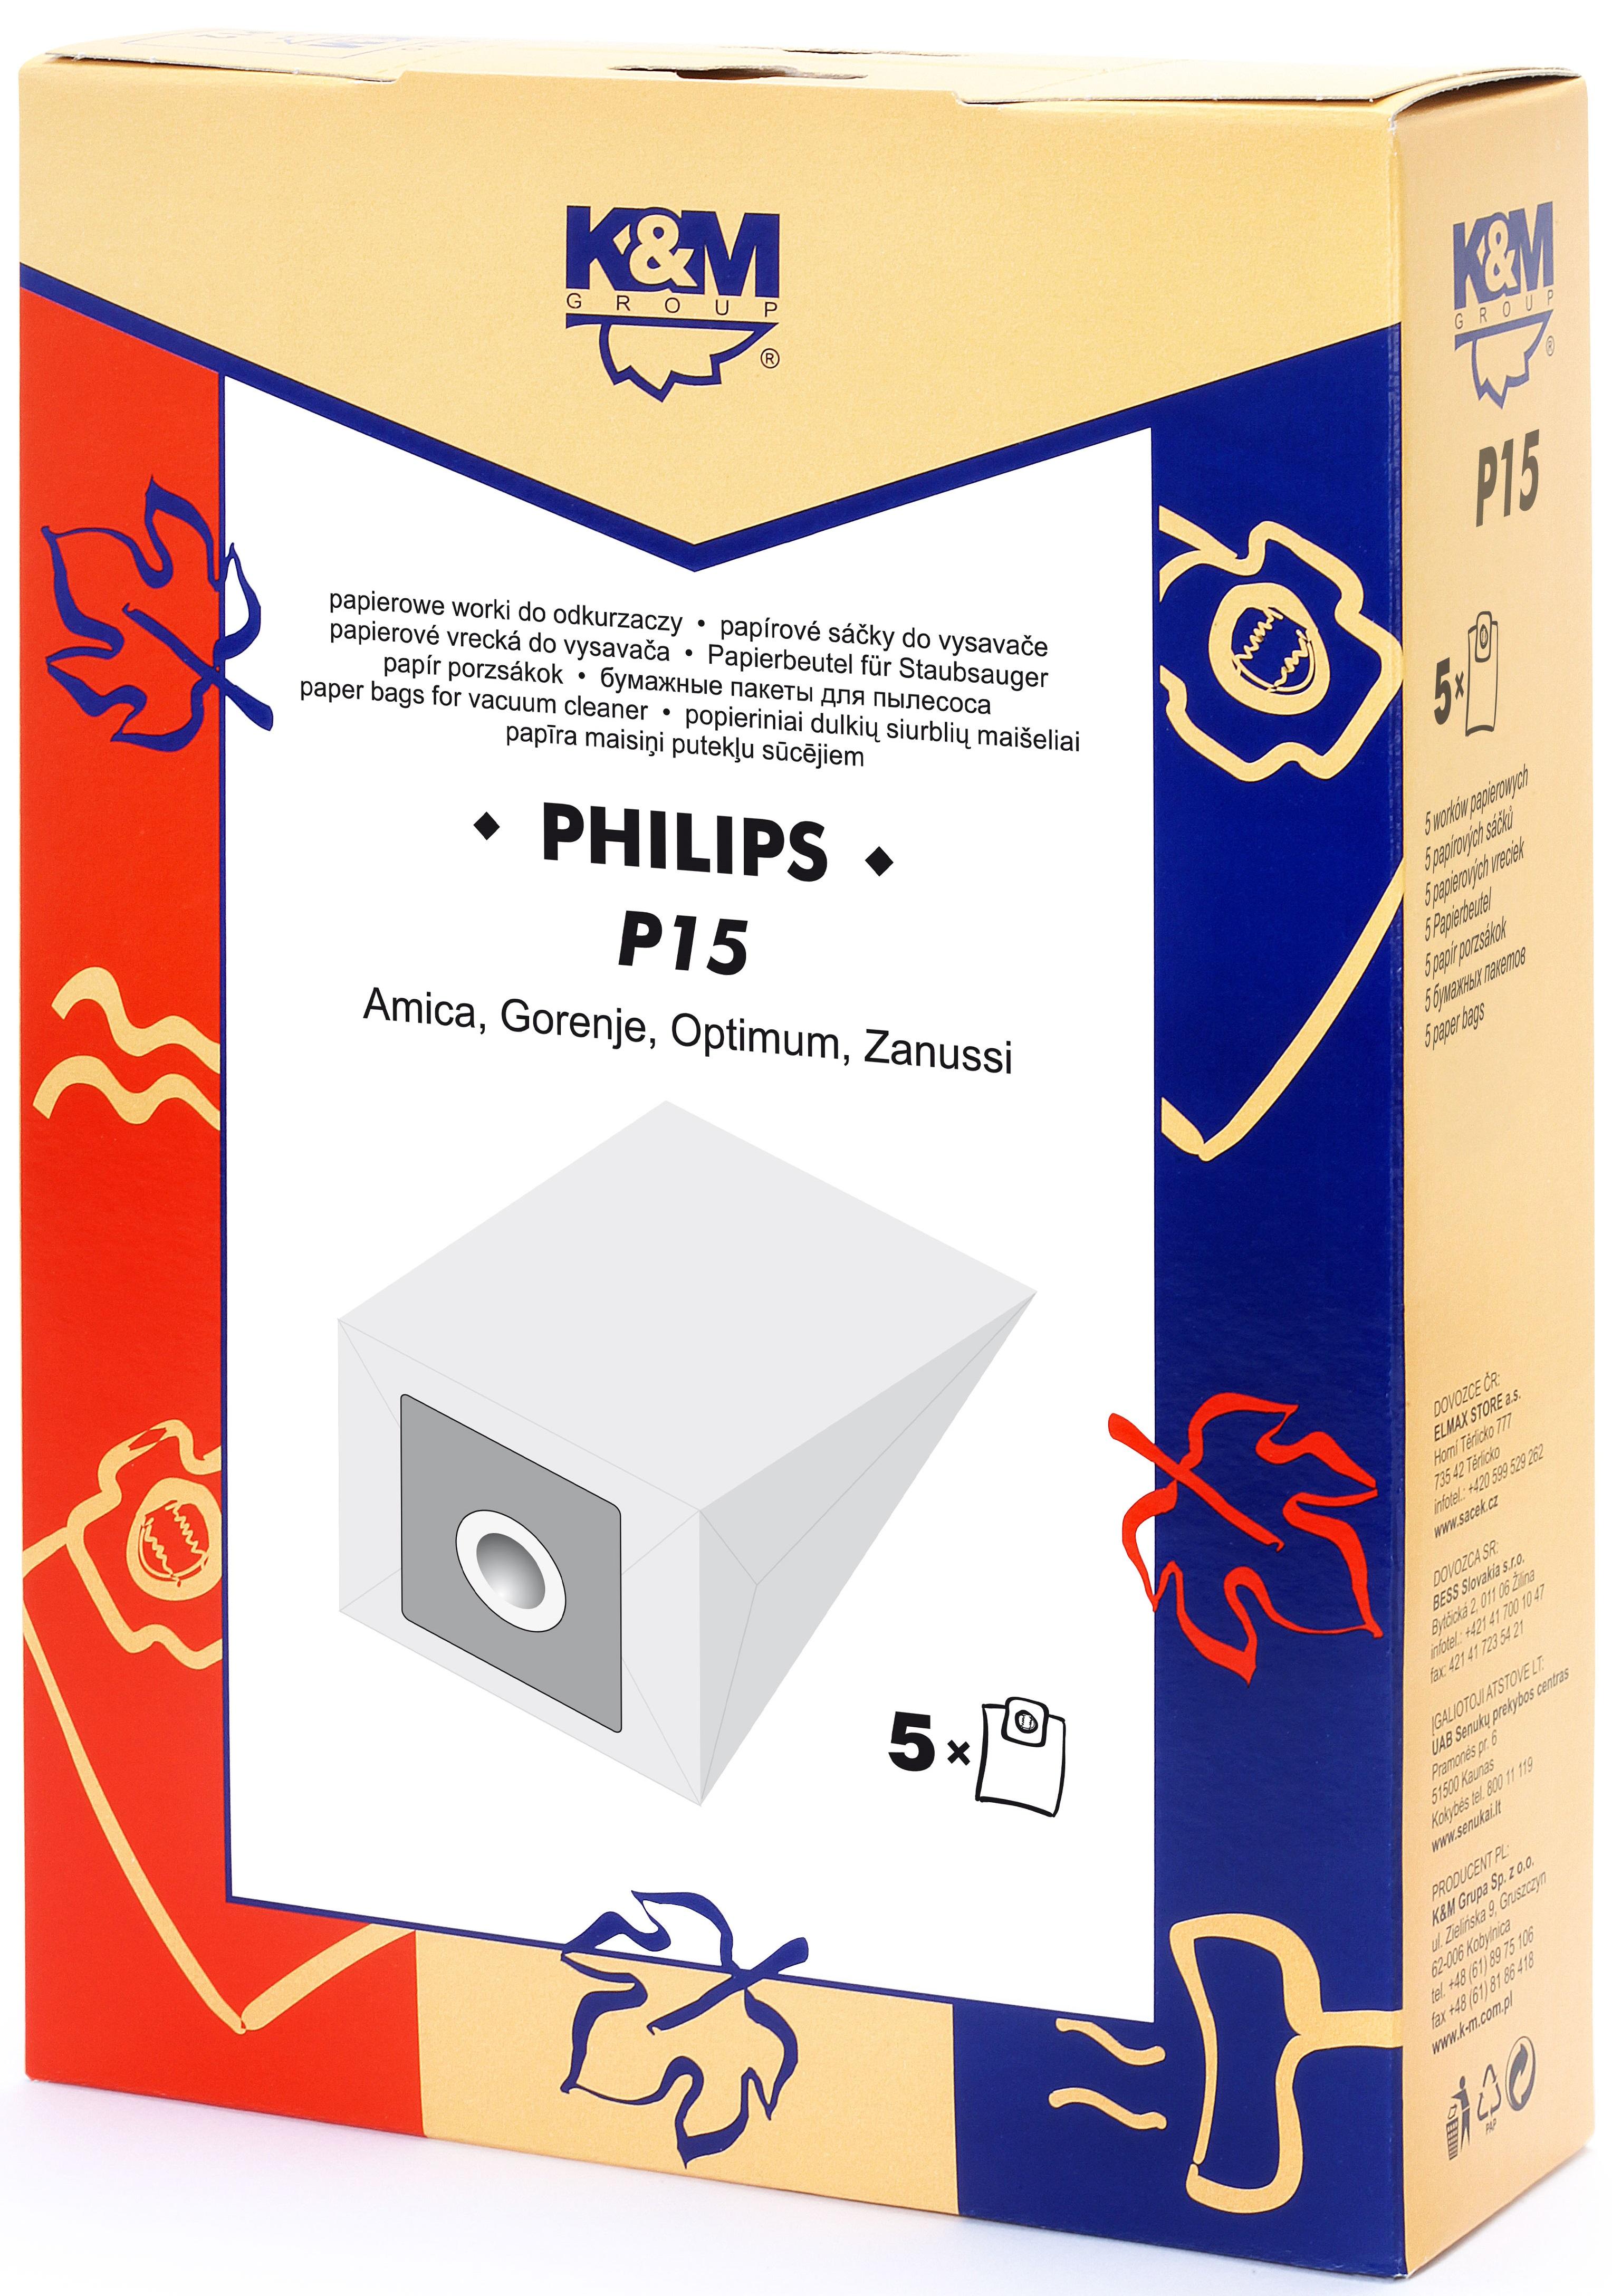 Sac aspirator Philips FC 8344, hartie, 5X saci, K&M 0